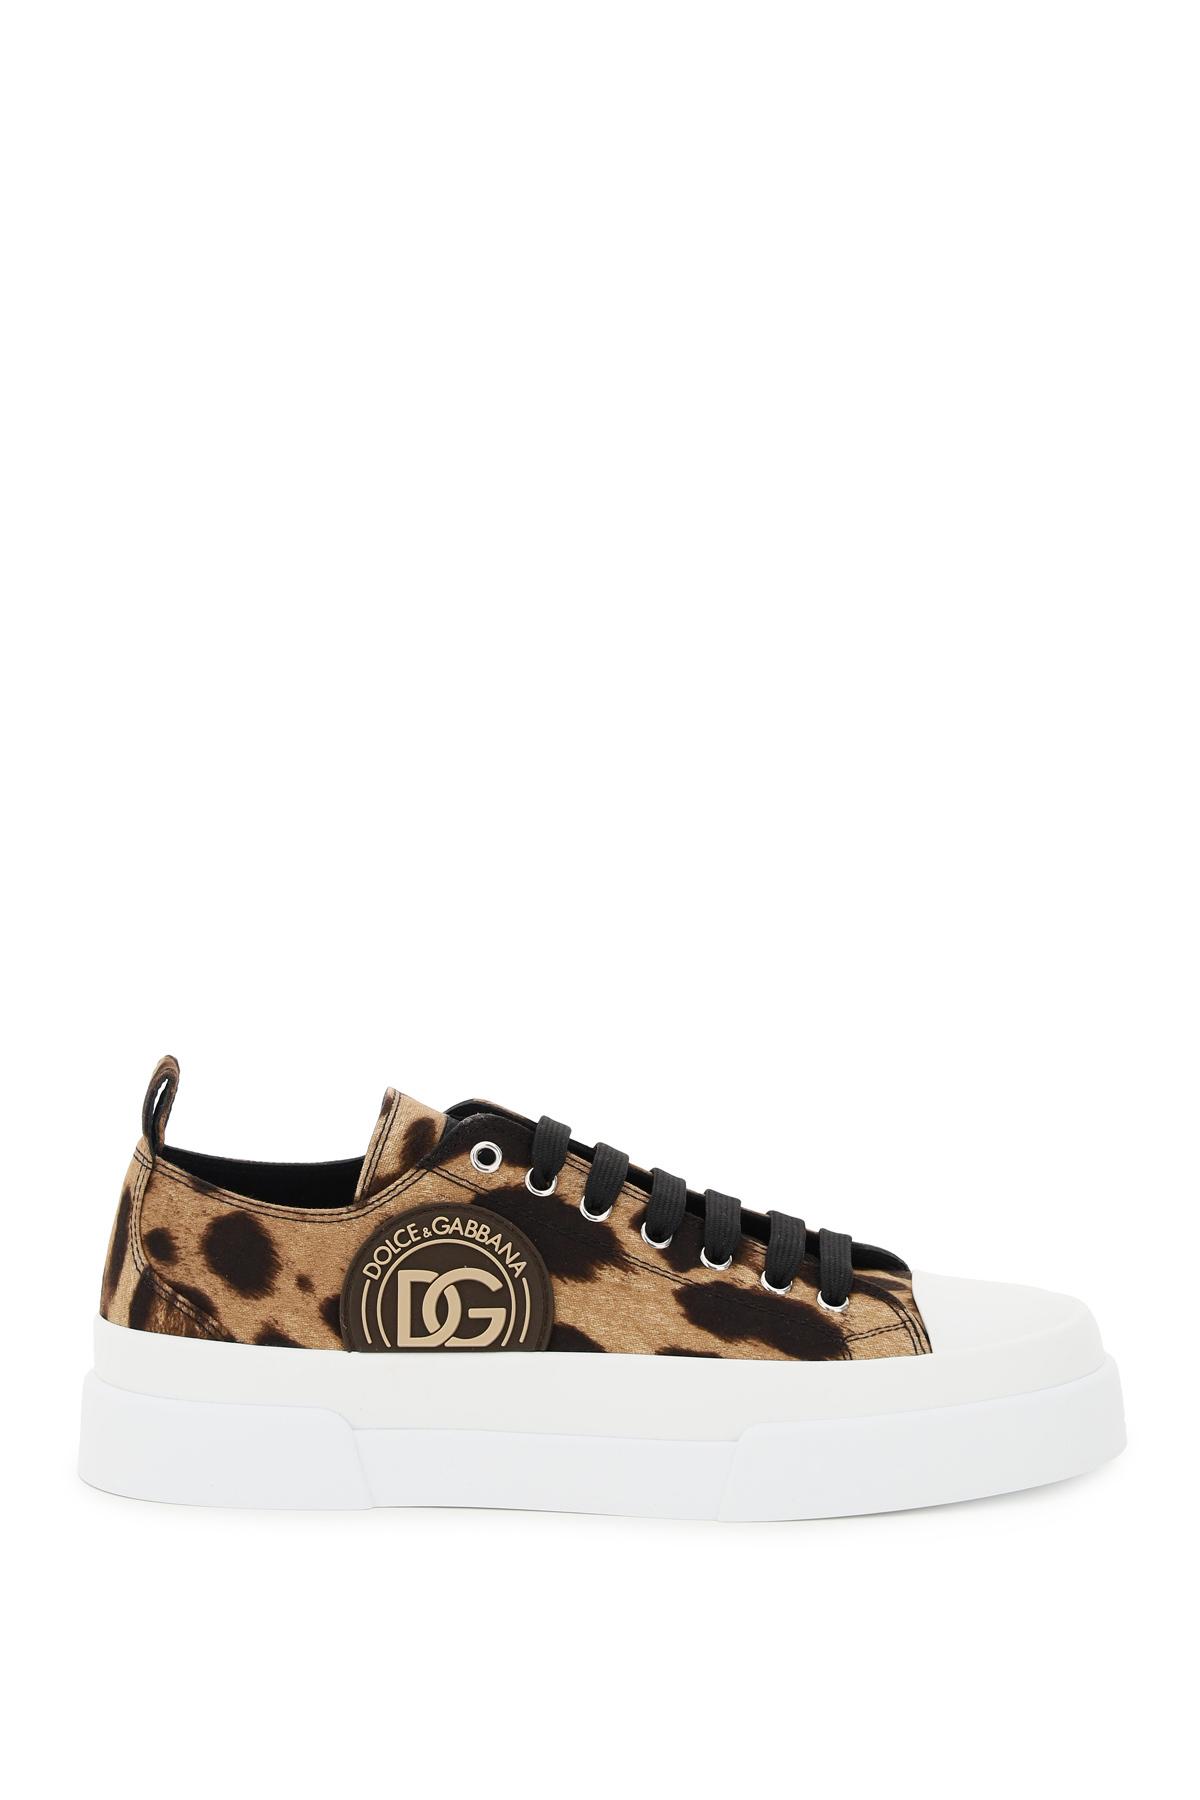 Dolce & gabbana sneakers bassa